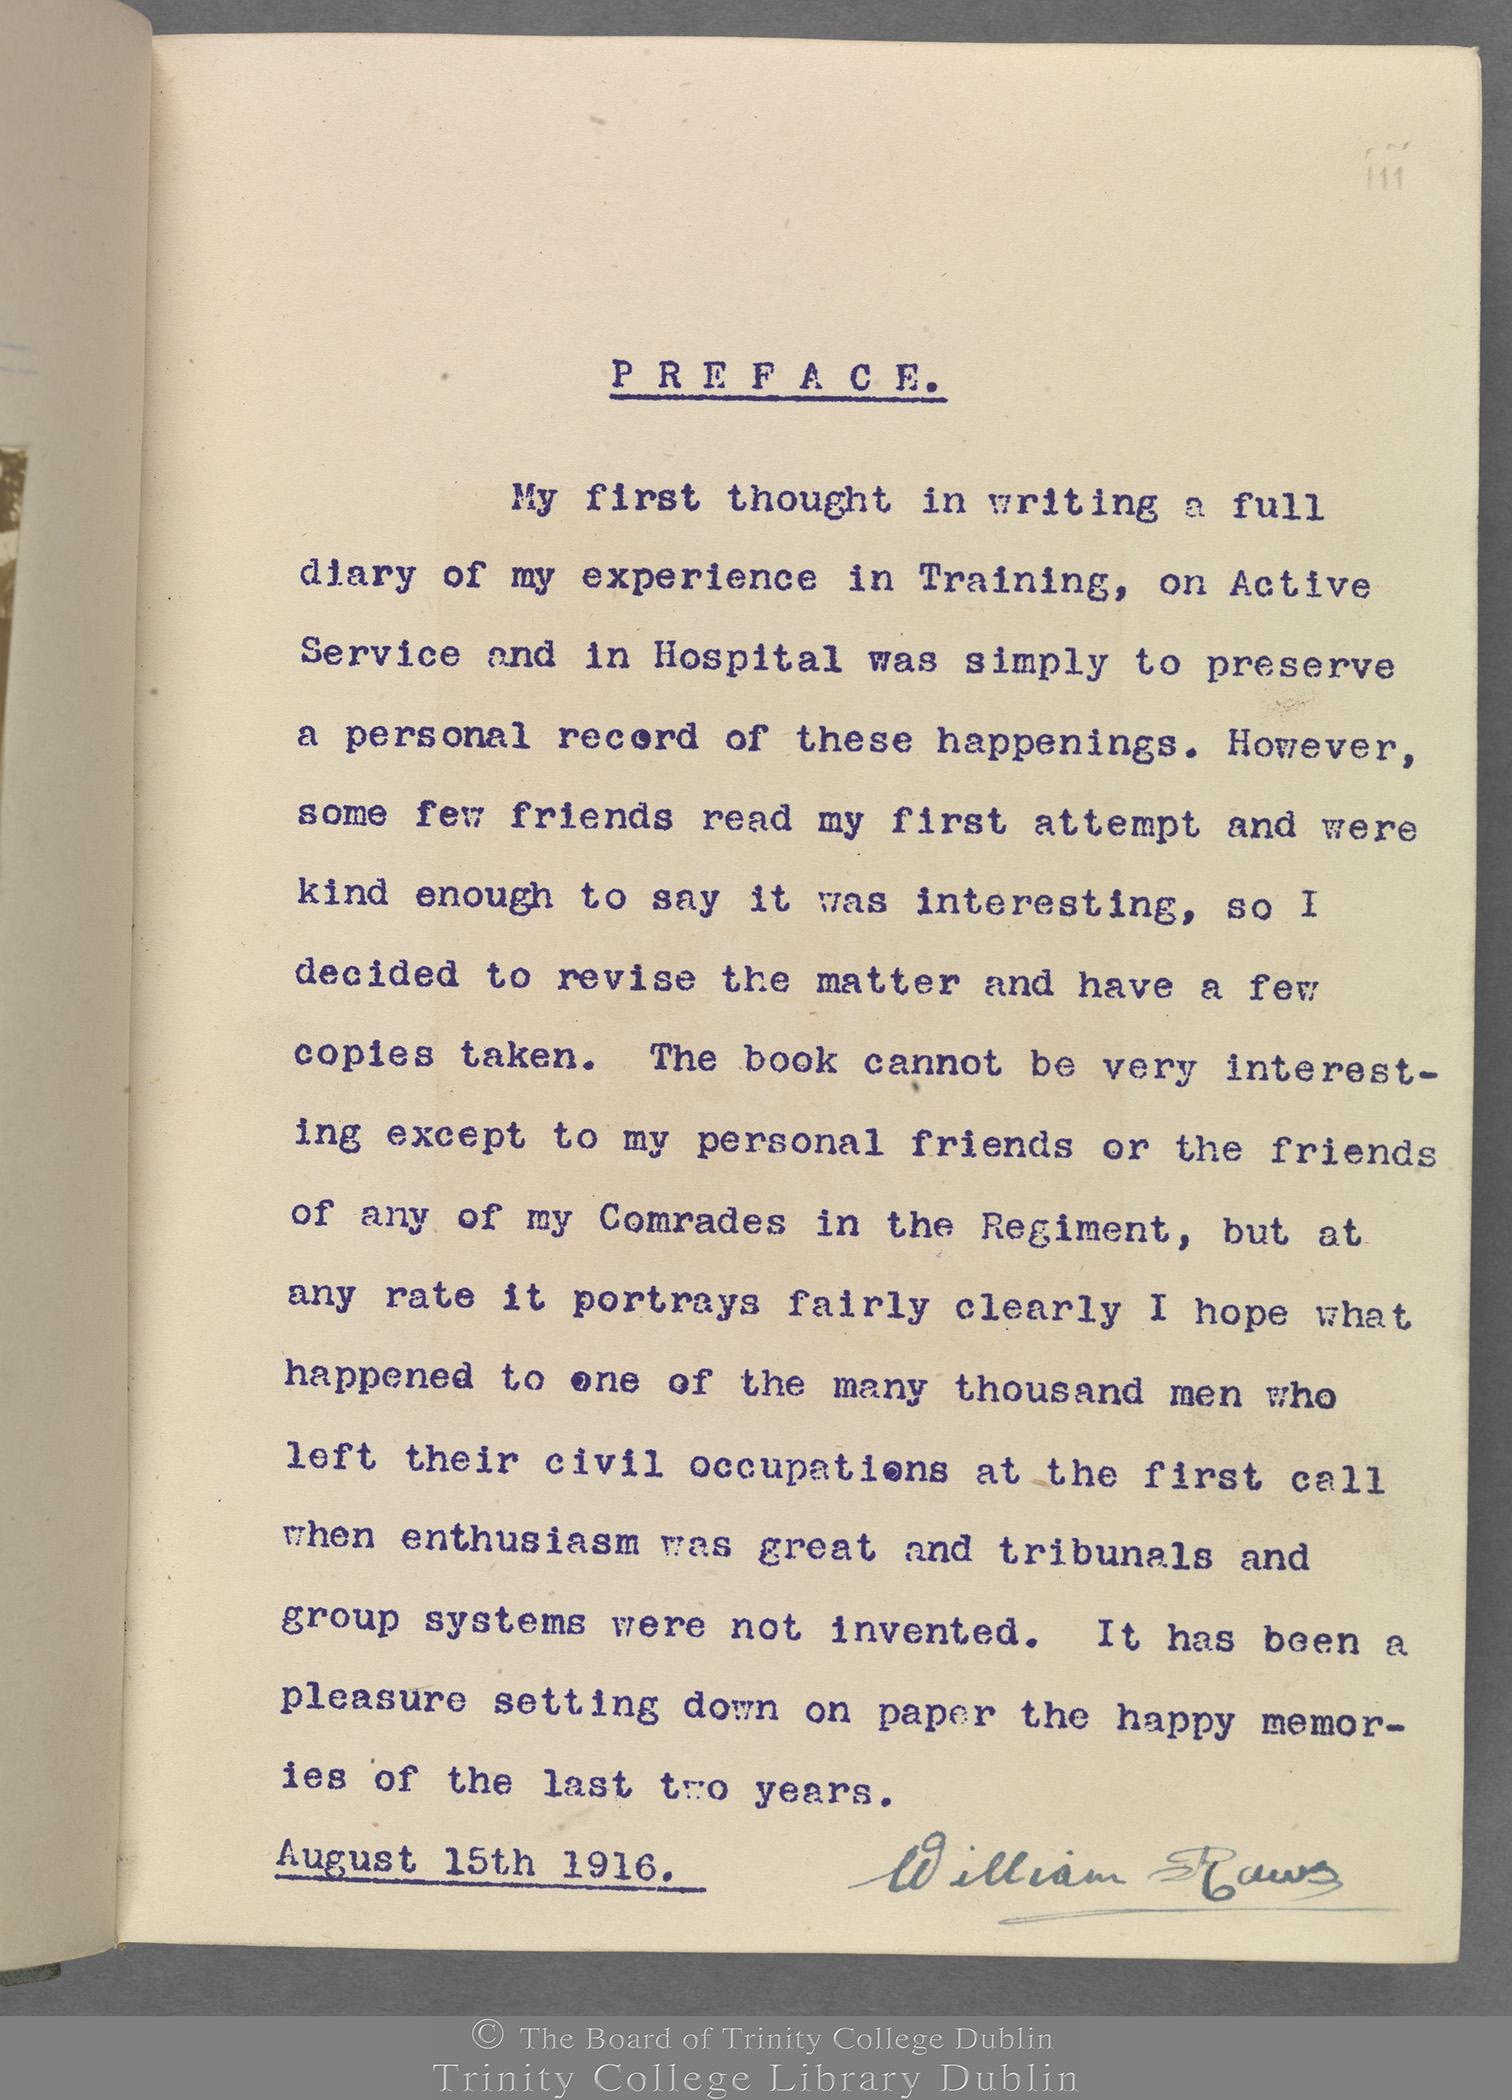 TCD MS 10853 folio iii recto